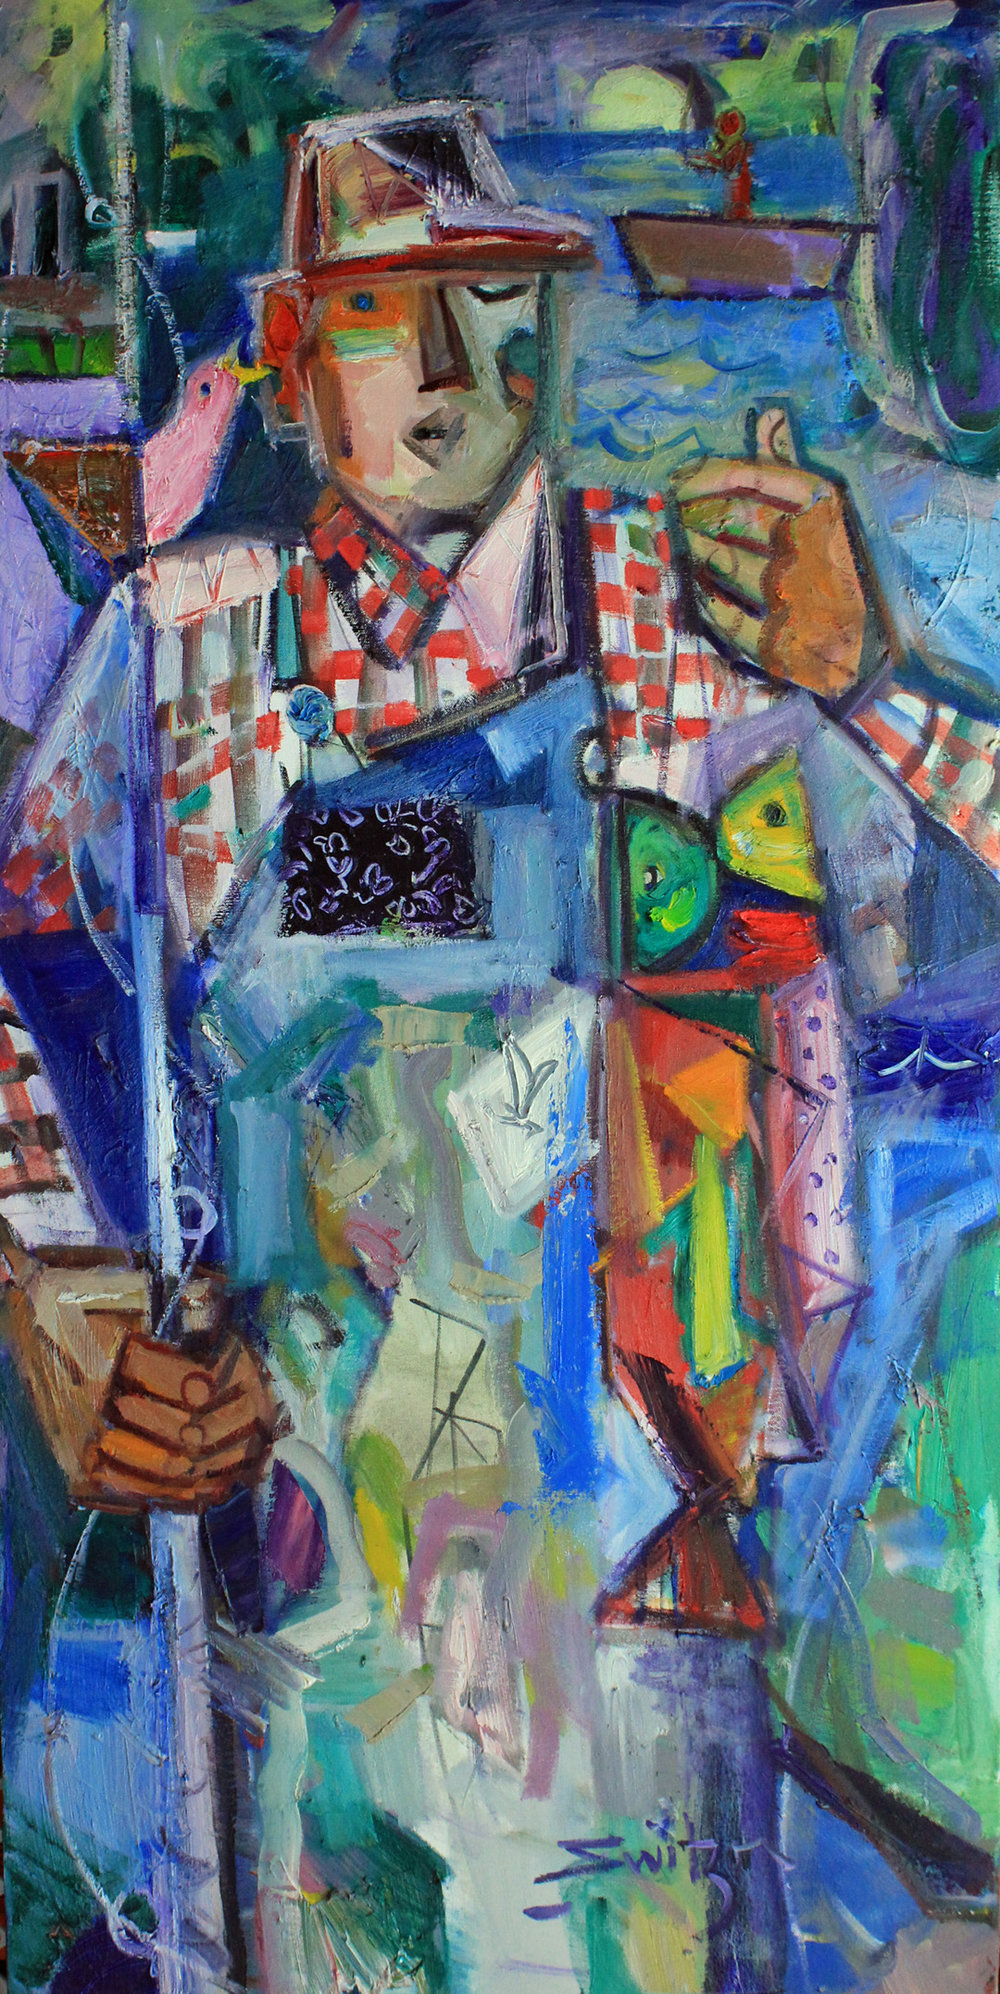 """Dream Fish"", 48x24 inches, oil on canvas  $4700"